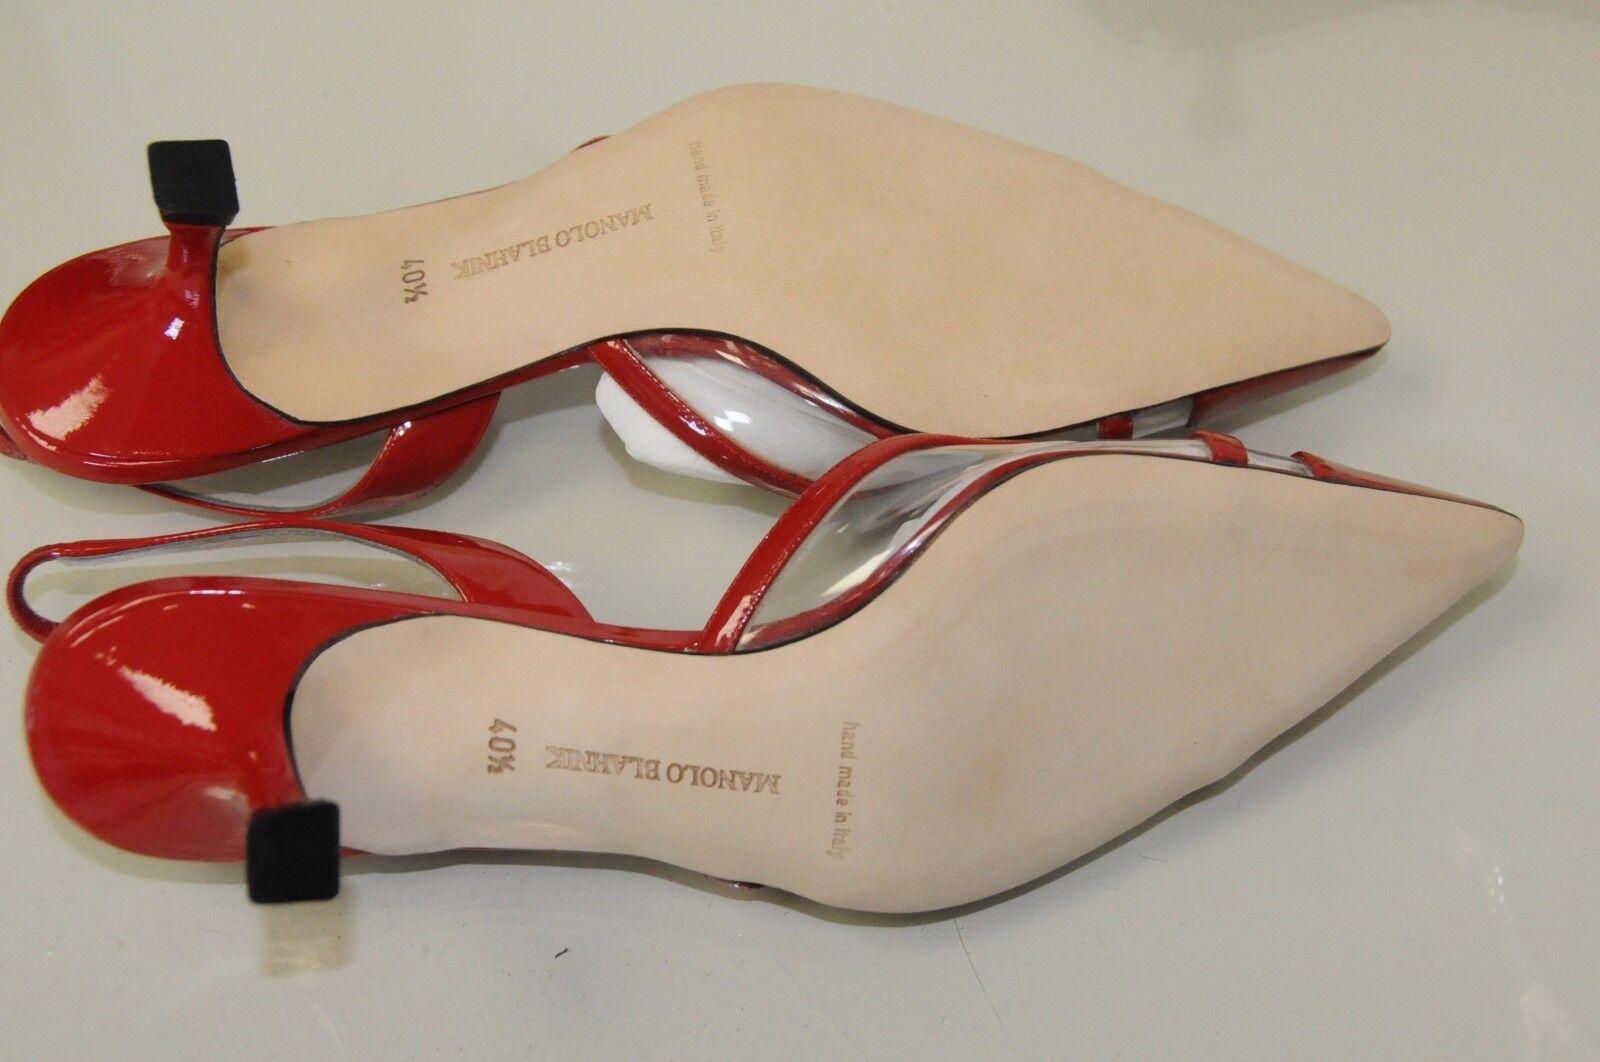 New MANOLO Red BLAHNIK Carolyne Red MANOLO Patent PVC Kitten Heels SHOES 36 38 40 28a891